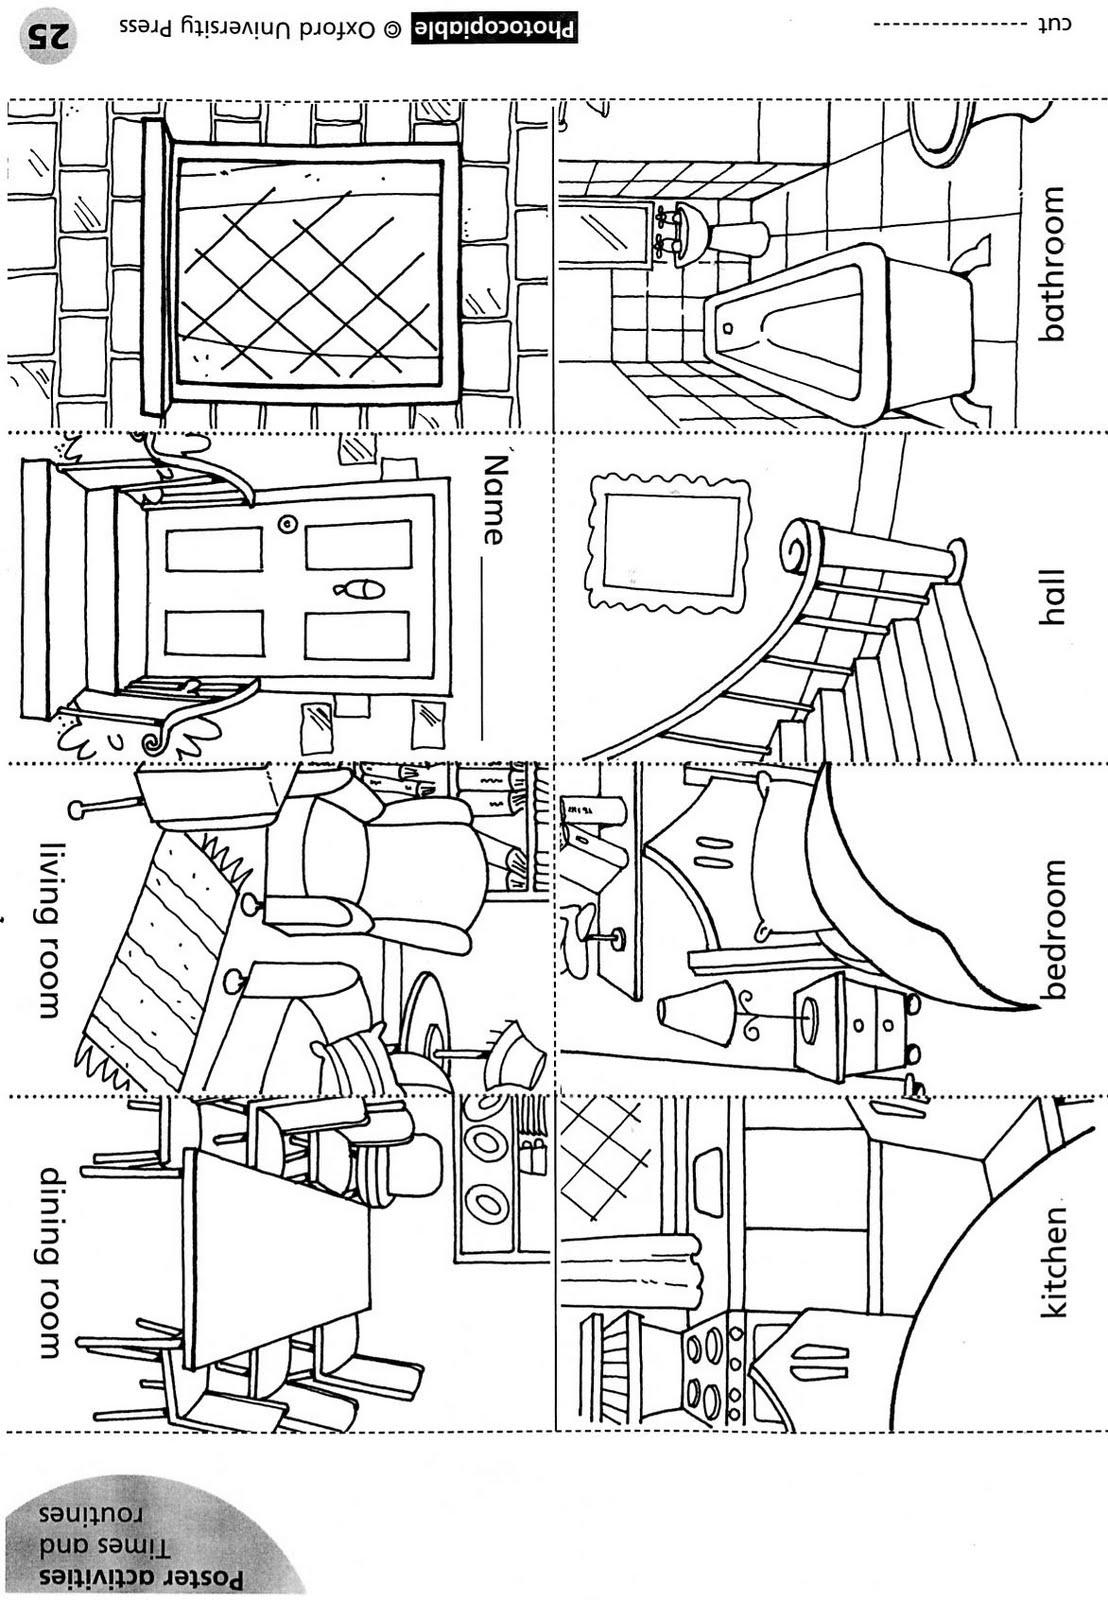 chair parts names design iron house mini book learningenglish esl